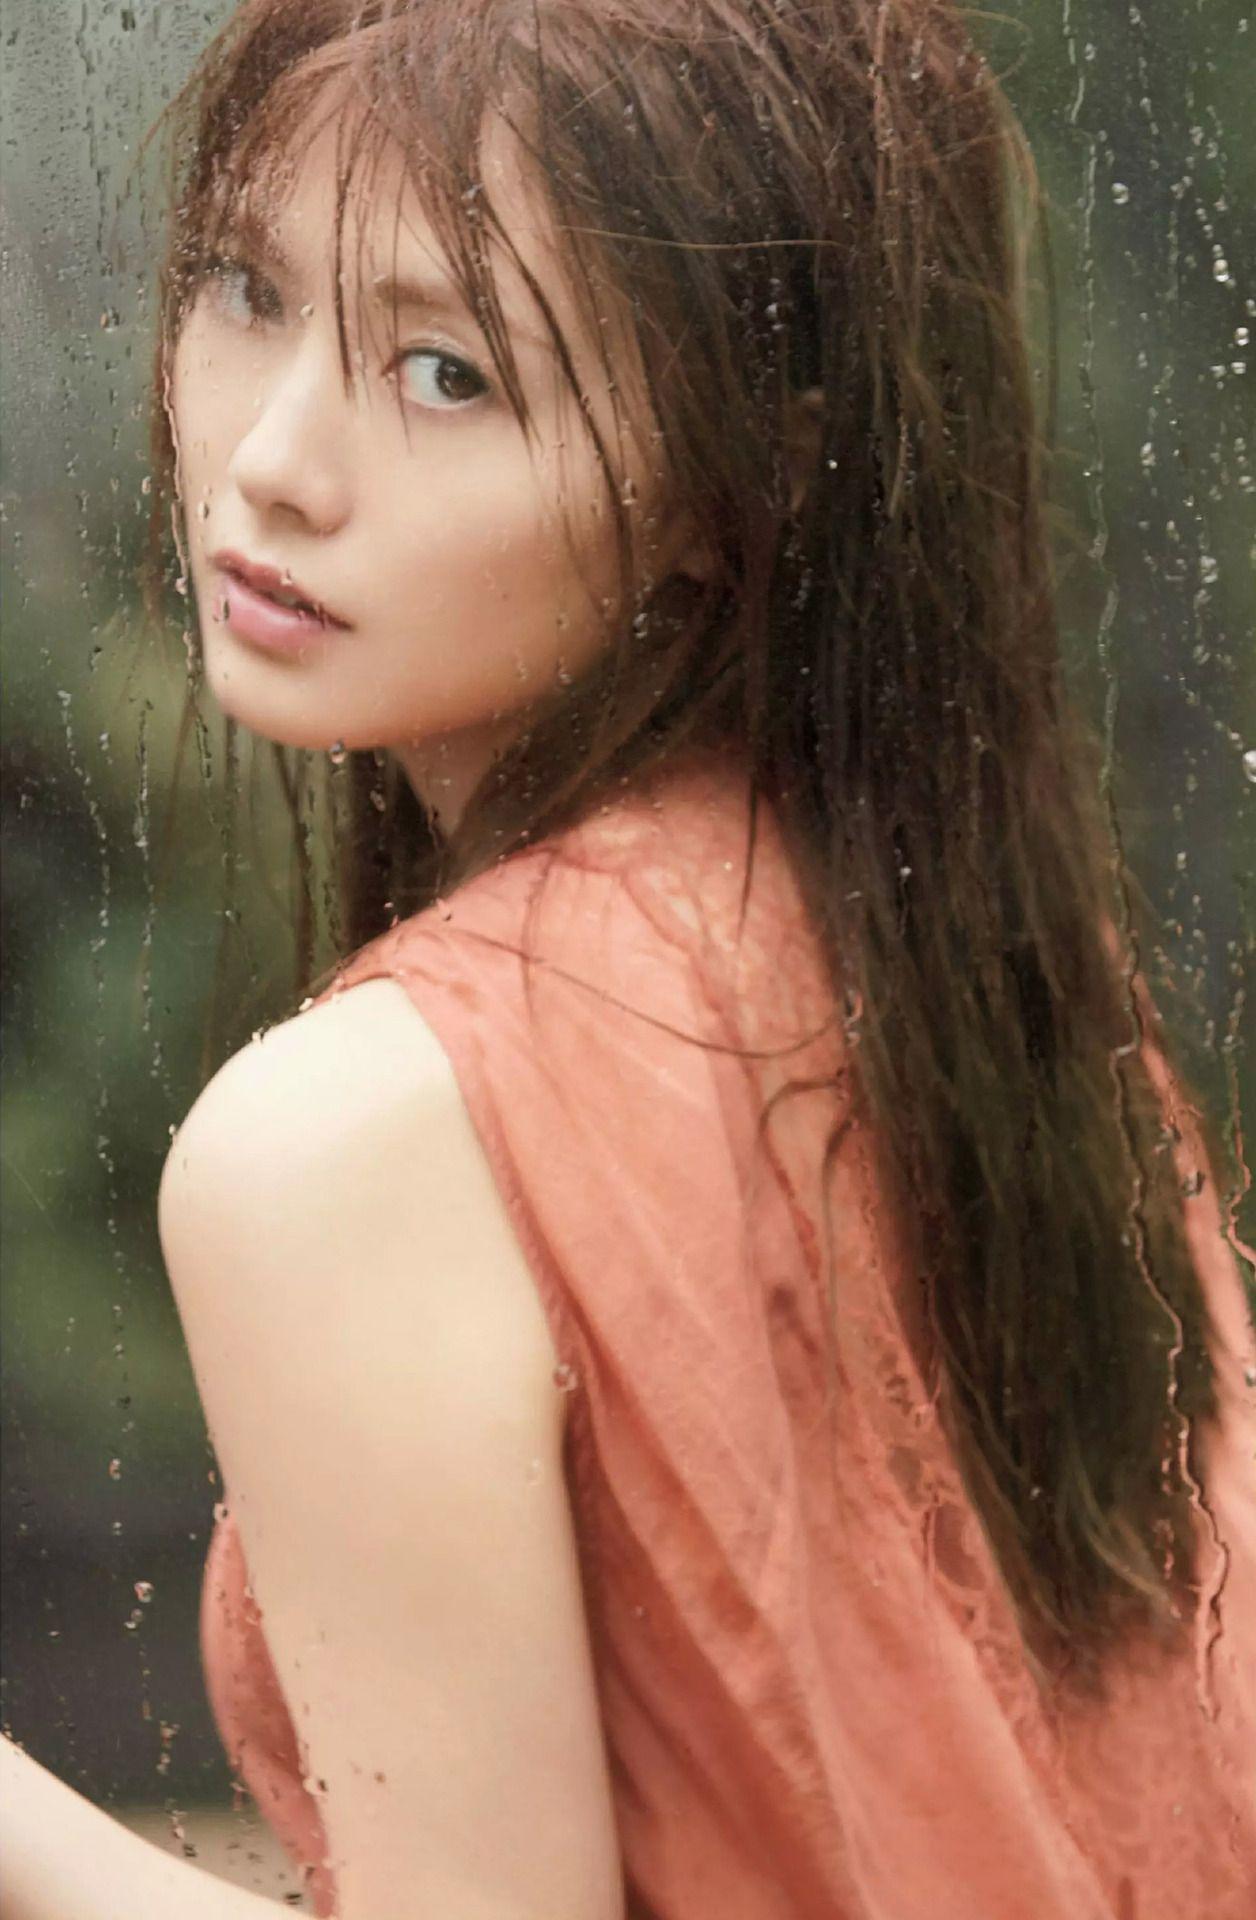 petashi — 46pic: Mai Shiraishi - Ray | ジャパニーズビューティー, アジアの女性, ヘアスタイル ロング